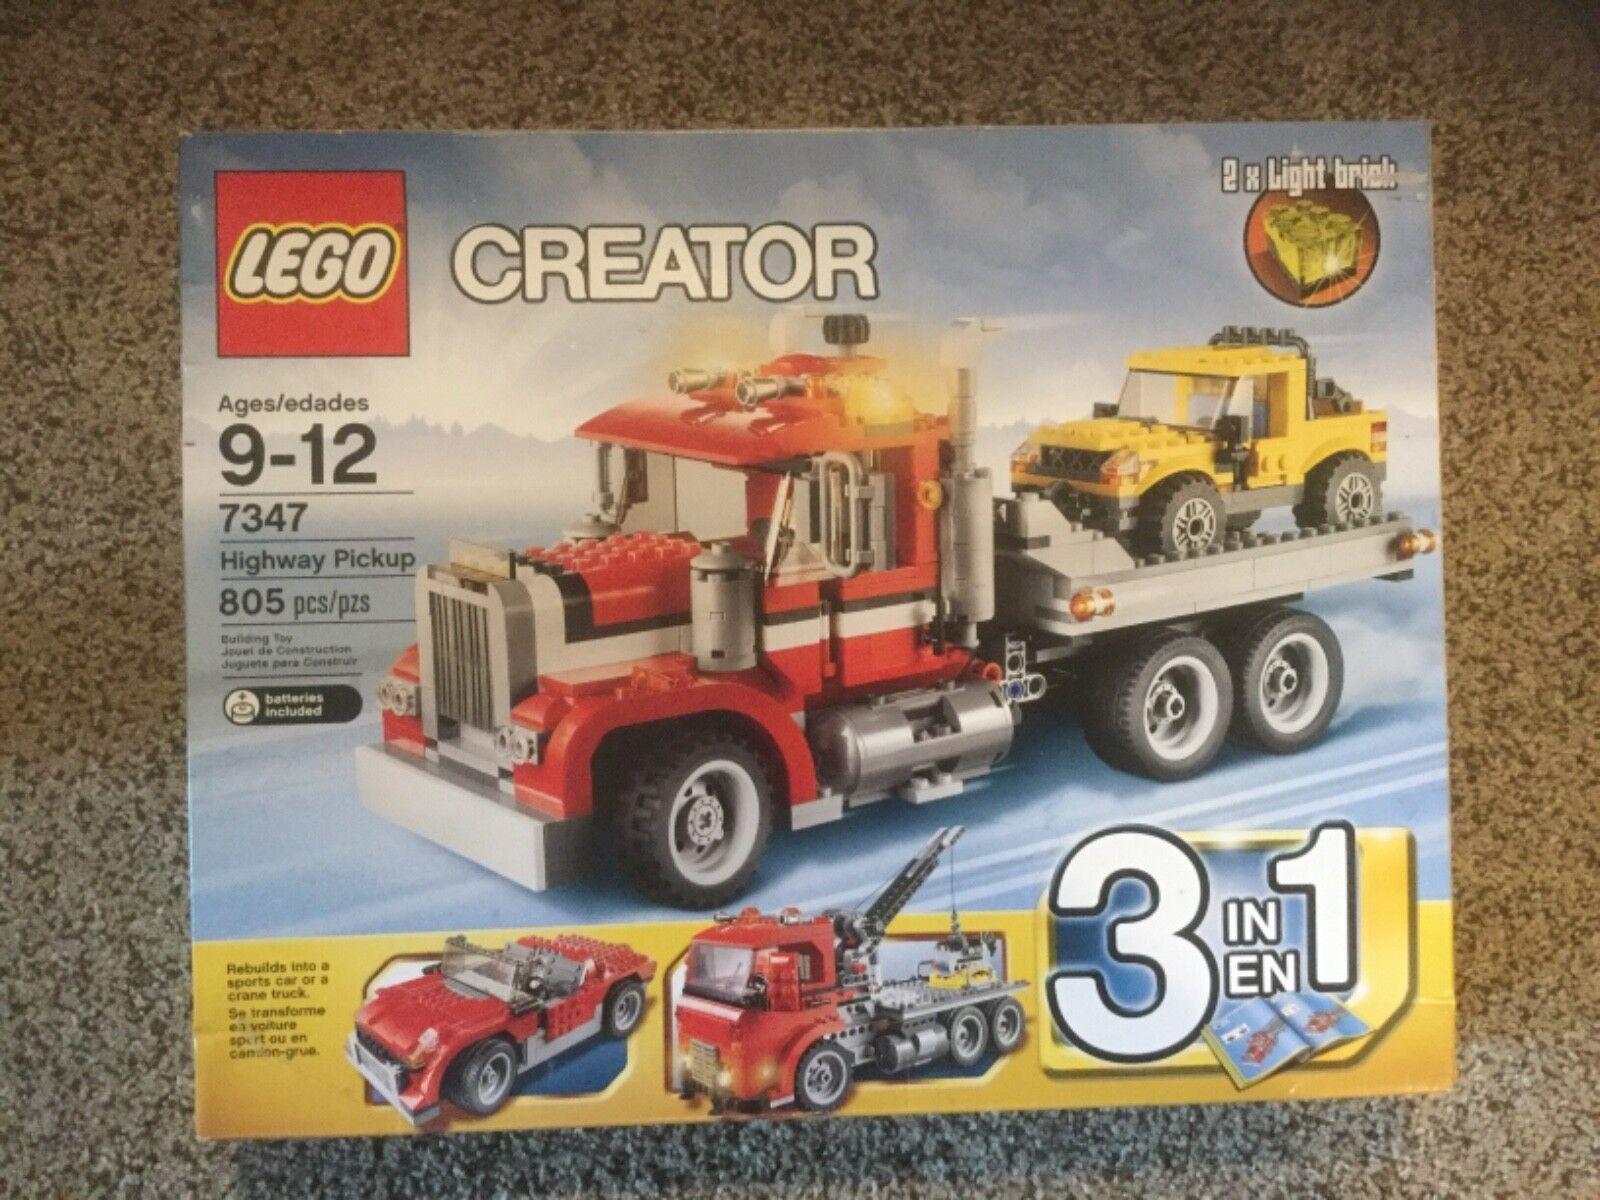 Nuevo en caja Lego Creator autopista Pickup (7347)